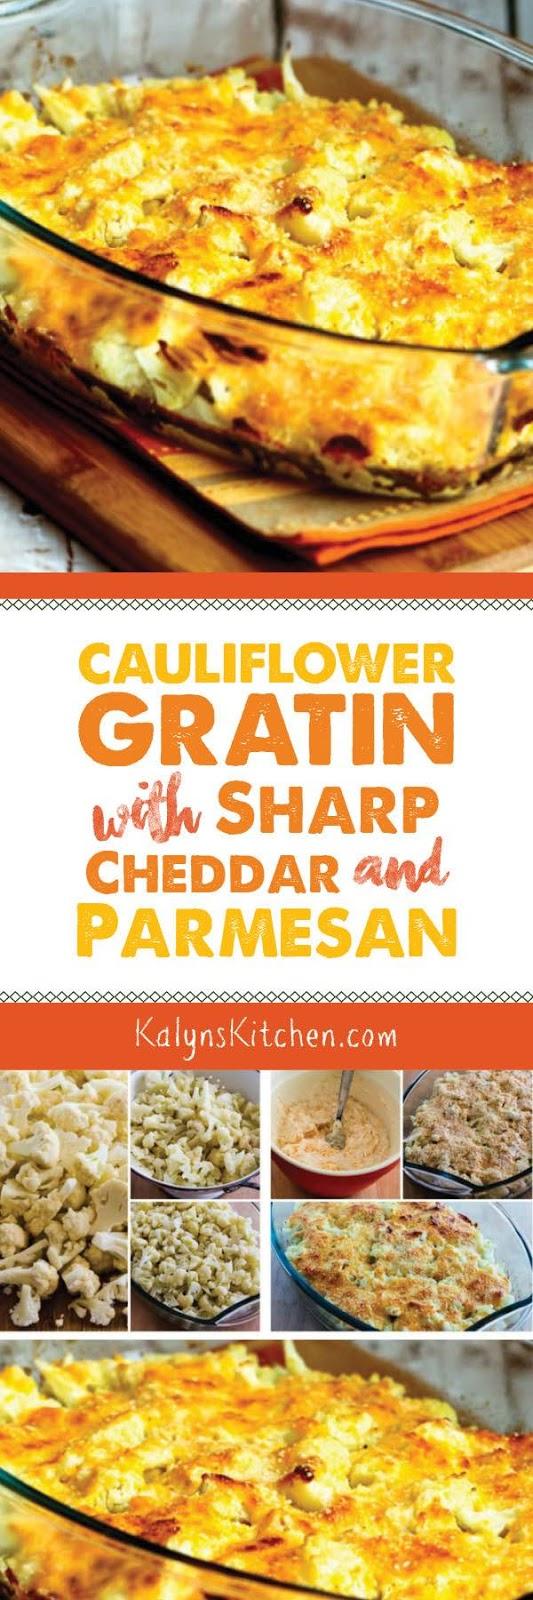 Cauliflower Gratin with Sharp Cheddar and Parmesan - Kalyn ...